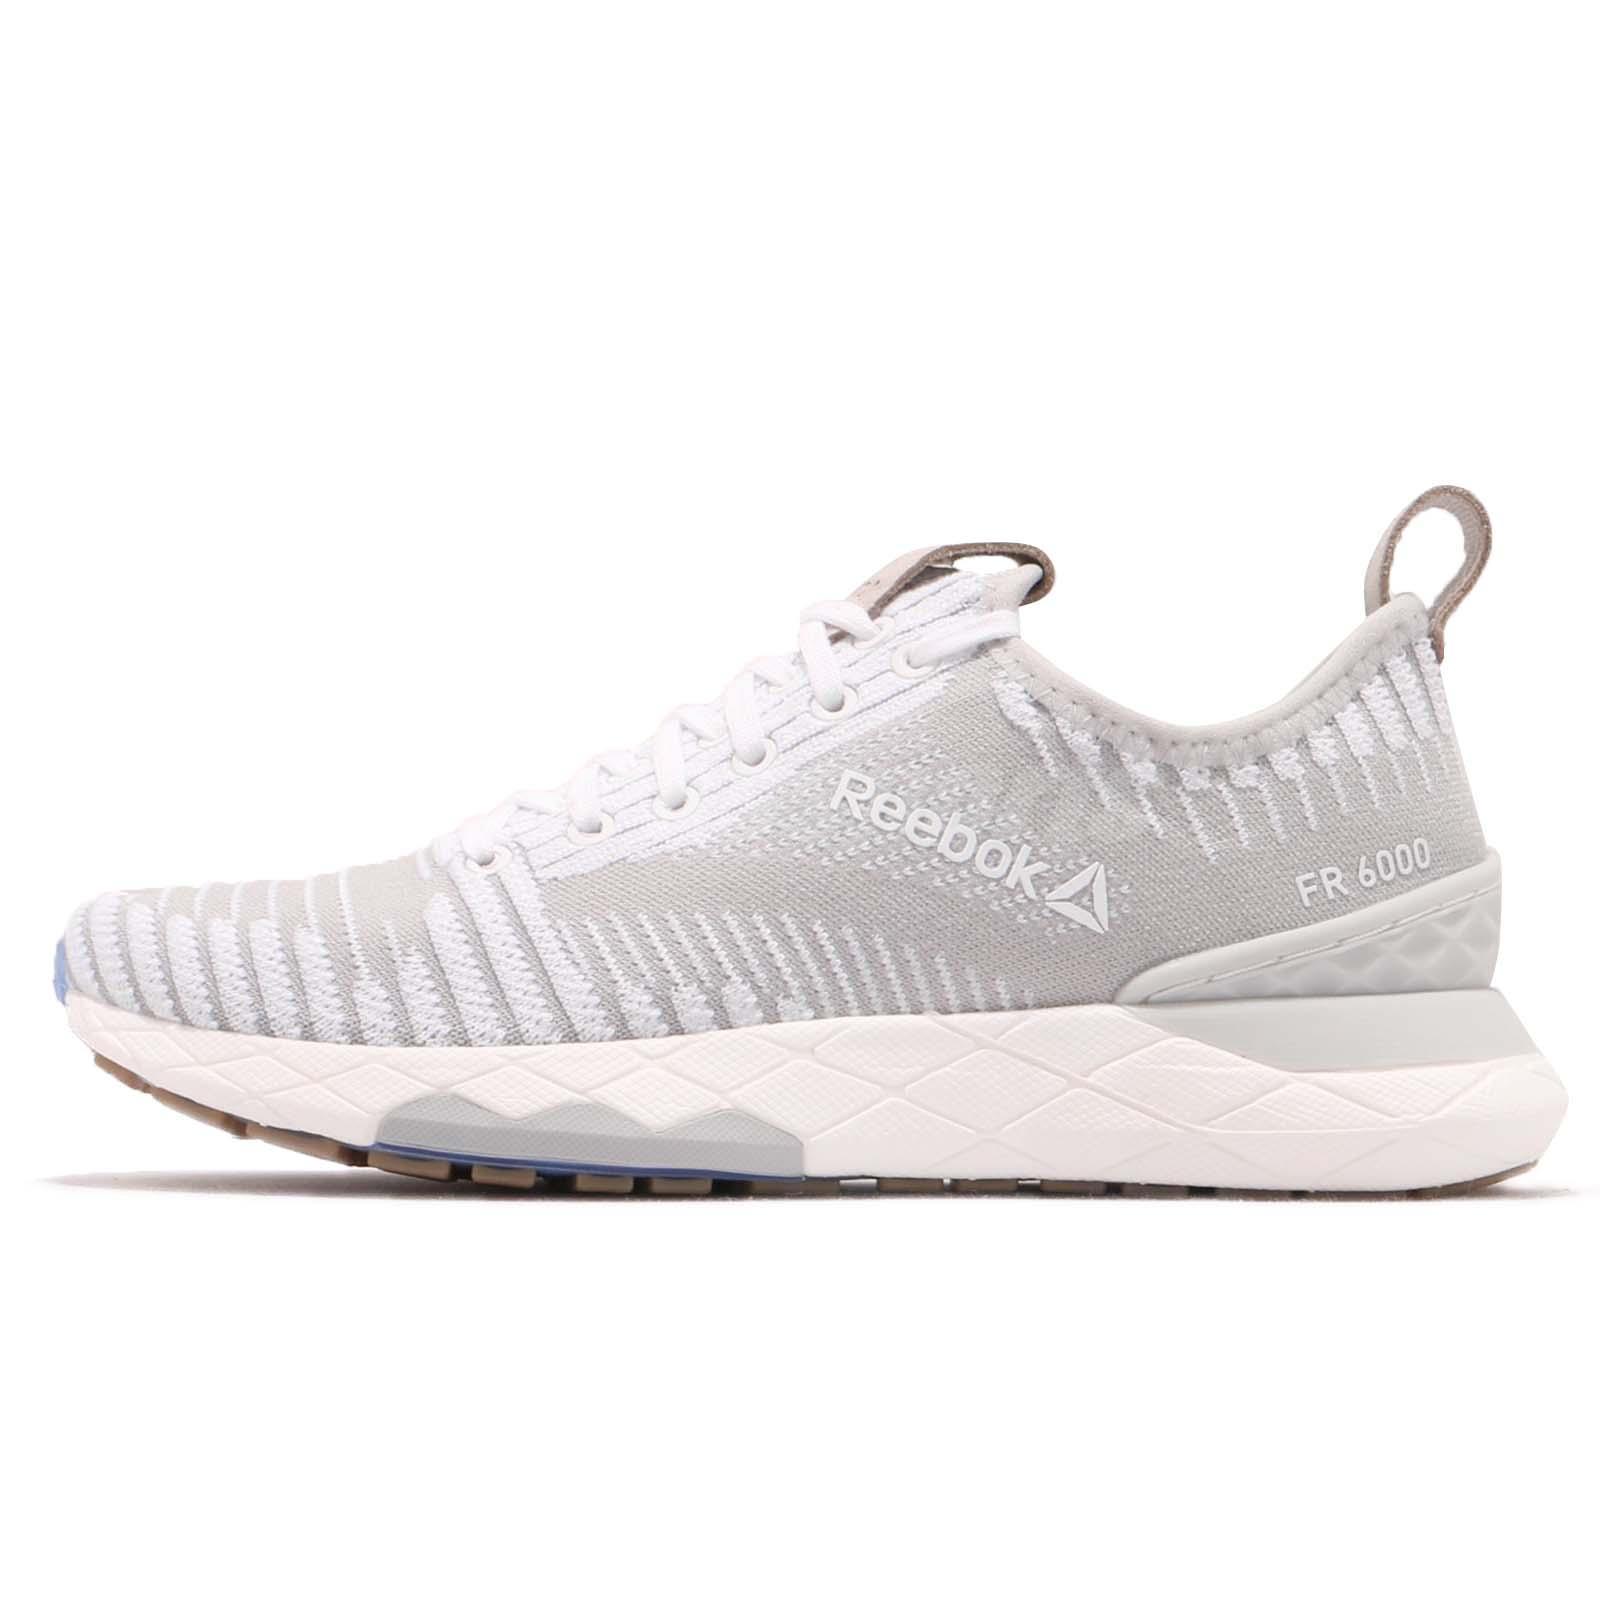 8782b6a0e5f Details about Reebok Floatride 6000 Ultraknit White Grey Stucco Women  Running Shoes CN1763